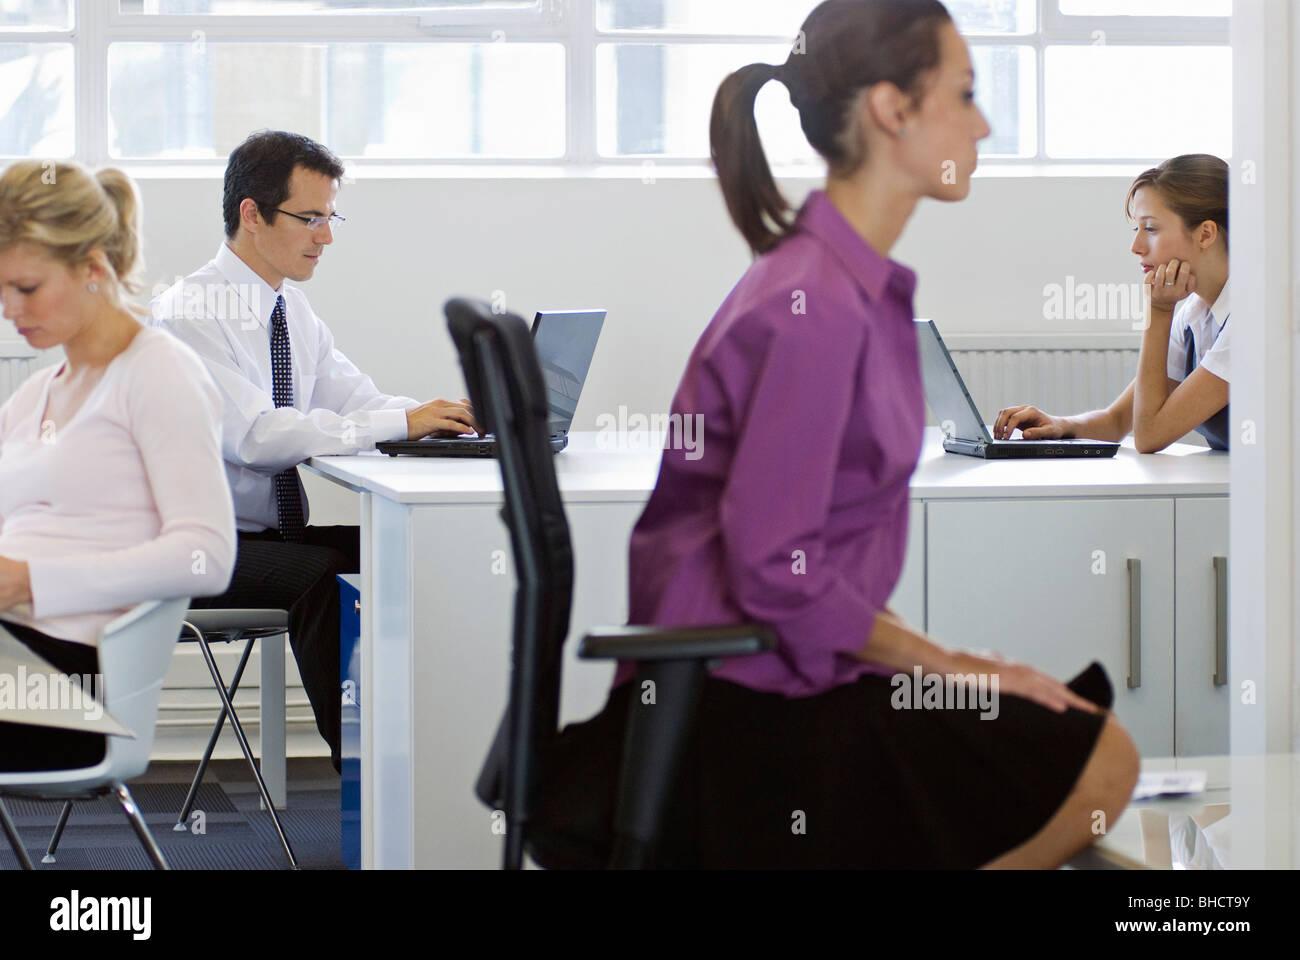 Eine funktionierende Büro Szene Stockbild